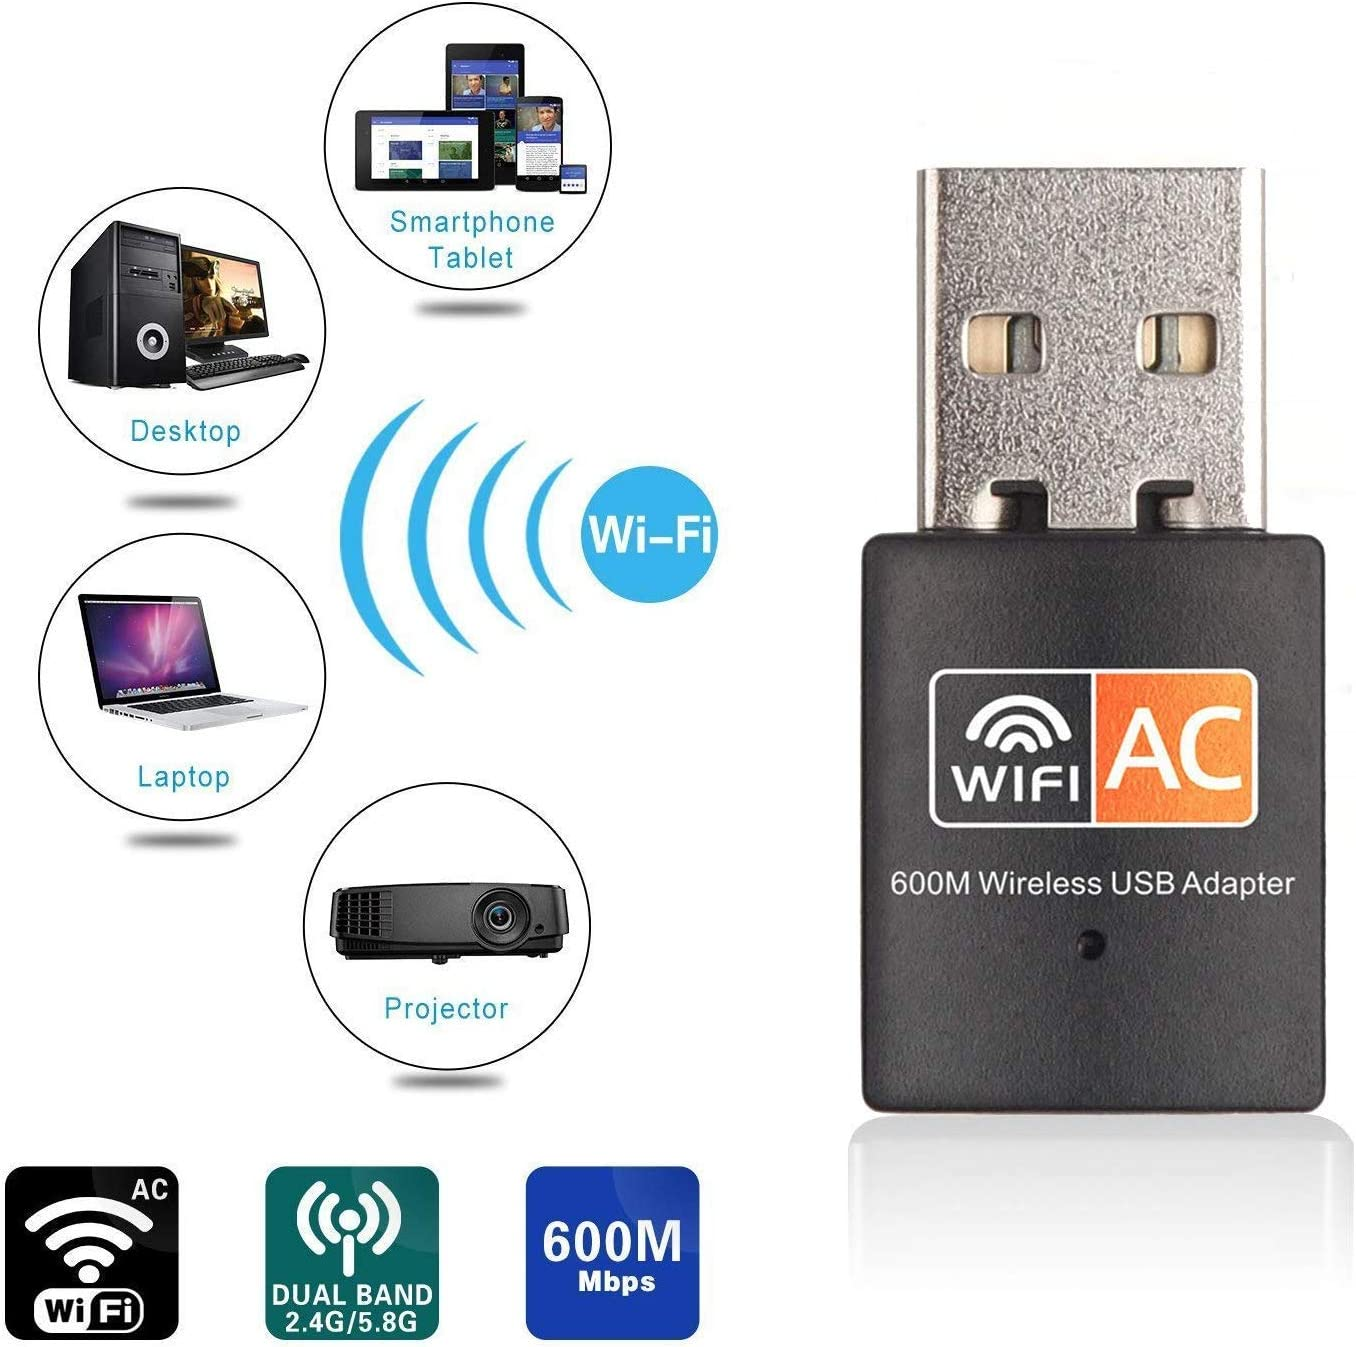 USB WiFi Adapter, AC600 Mbps Dual Band 2.4/5Ghz Wireless USB Mini WiFi Network Adapter 802.11 Mini Wireless for Laptop/Desktop/PC, Support Desktop Laptop MAC Book Windows Notebook